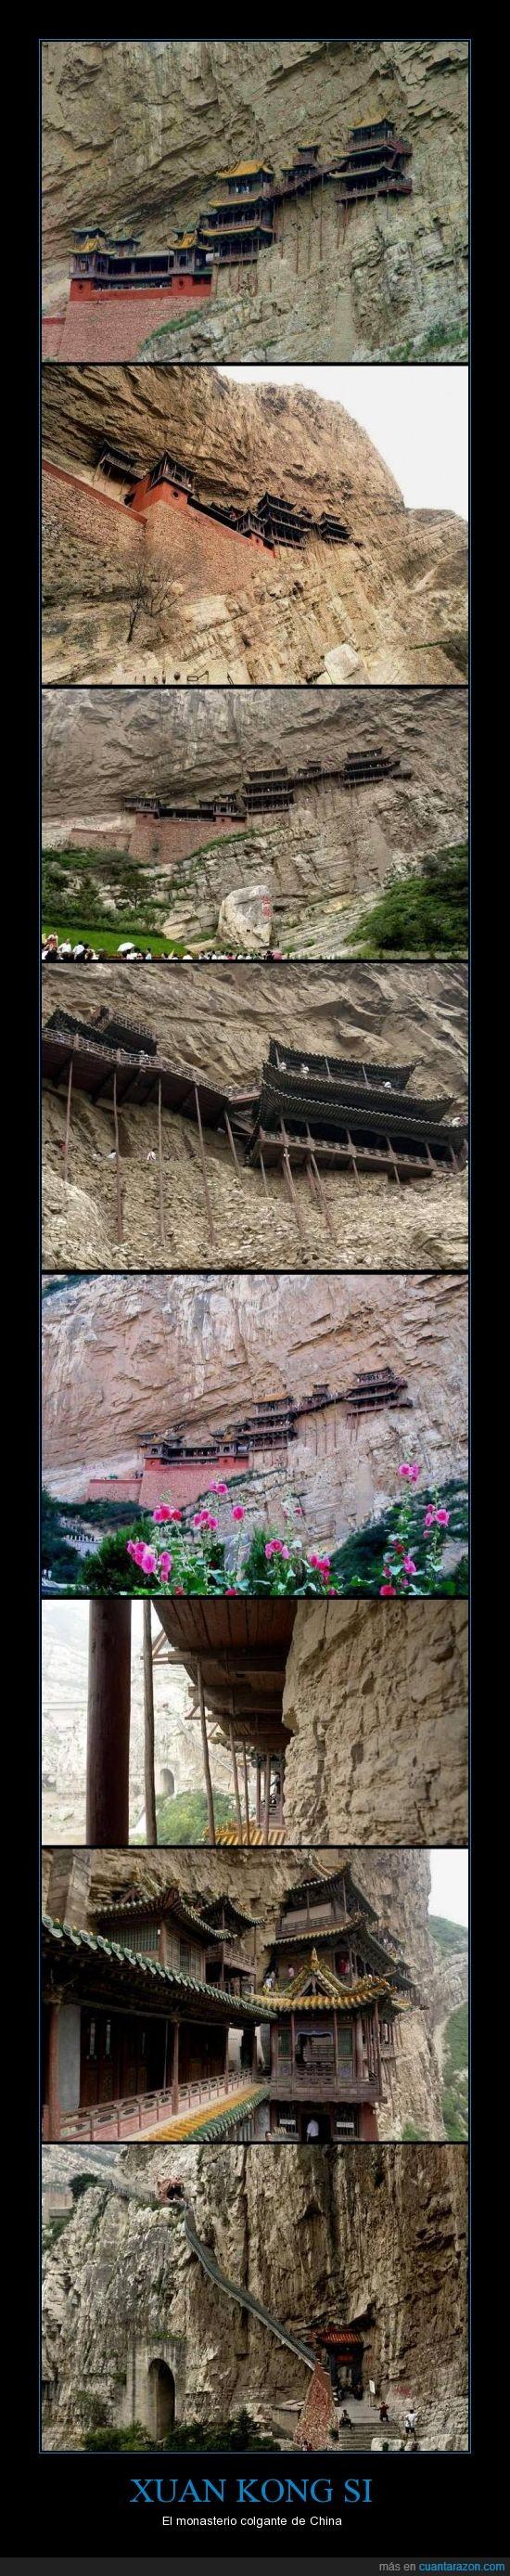 china,colgante,monasterio,monasterio suspendido,xuan kong si